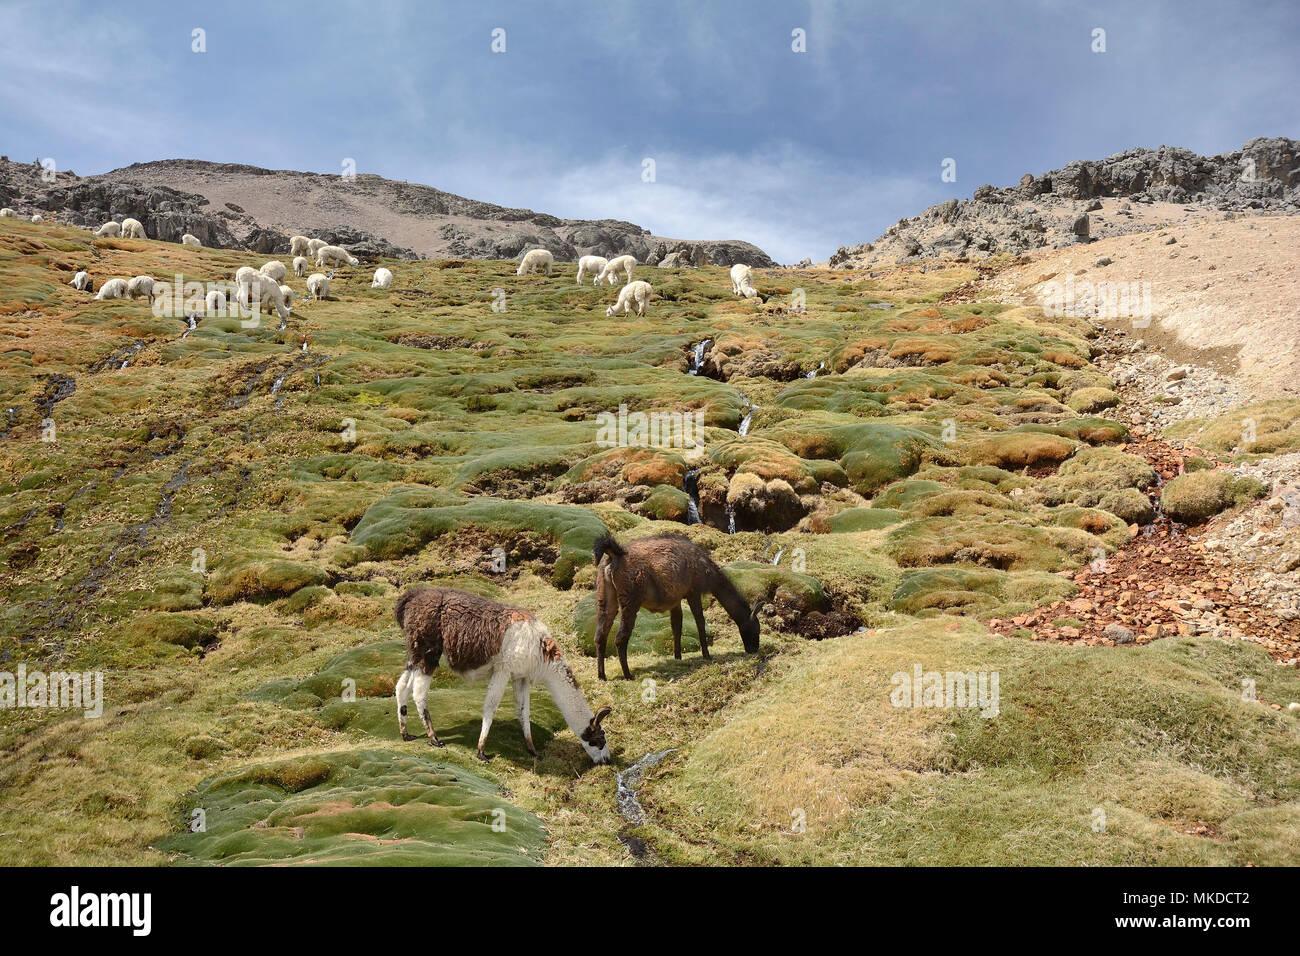 Herd of Alpacas (Vicugna pacos) in the Reserva Nacional Salinas and Aguada Blancas, Arequipa Region, Peru - Stock Image